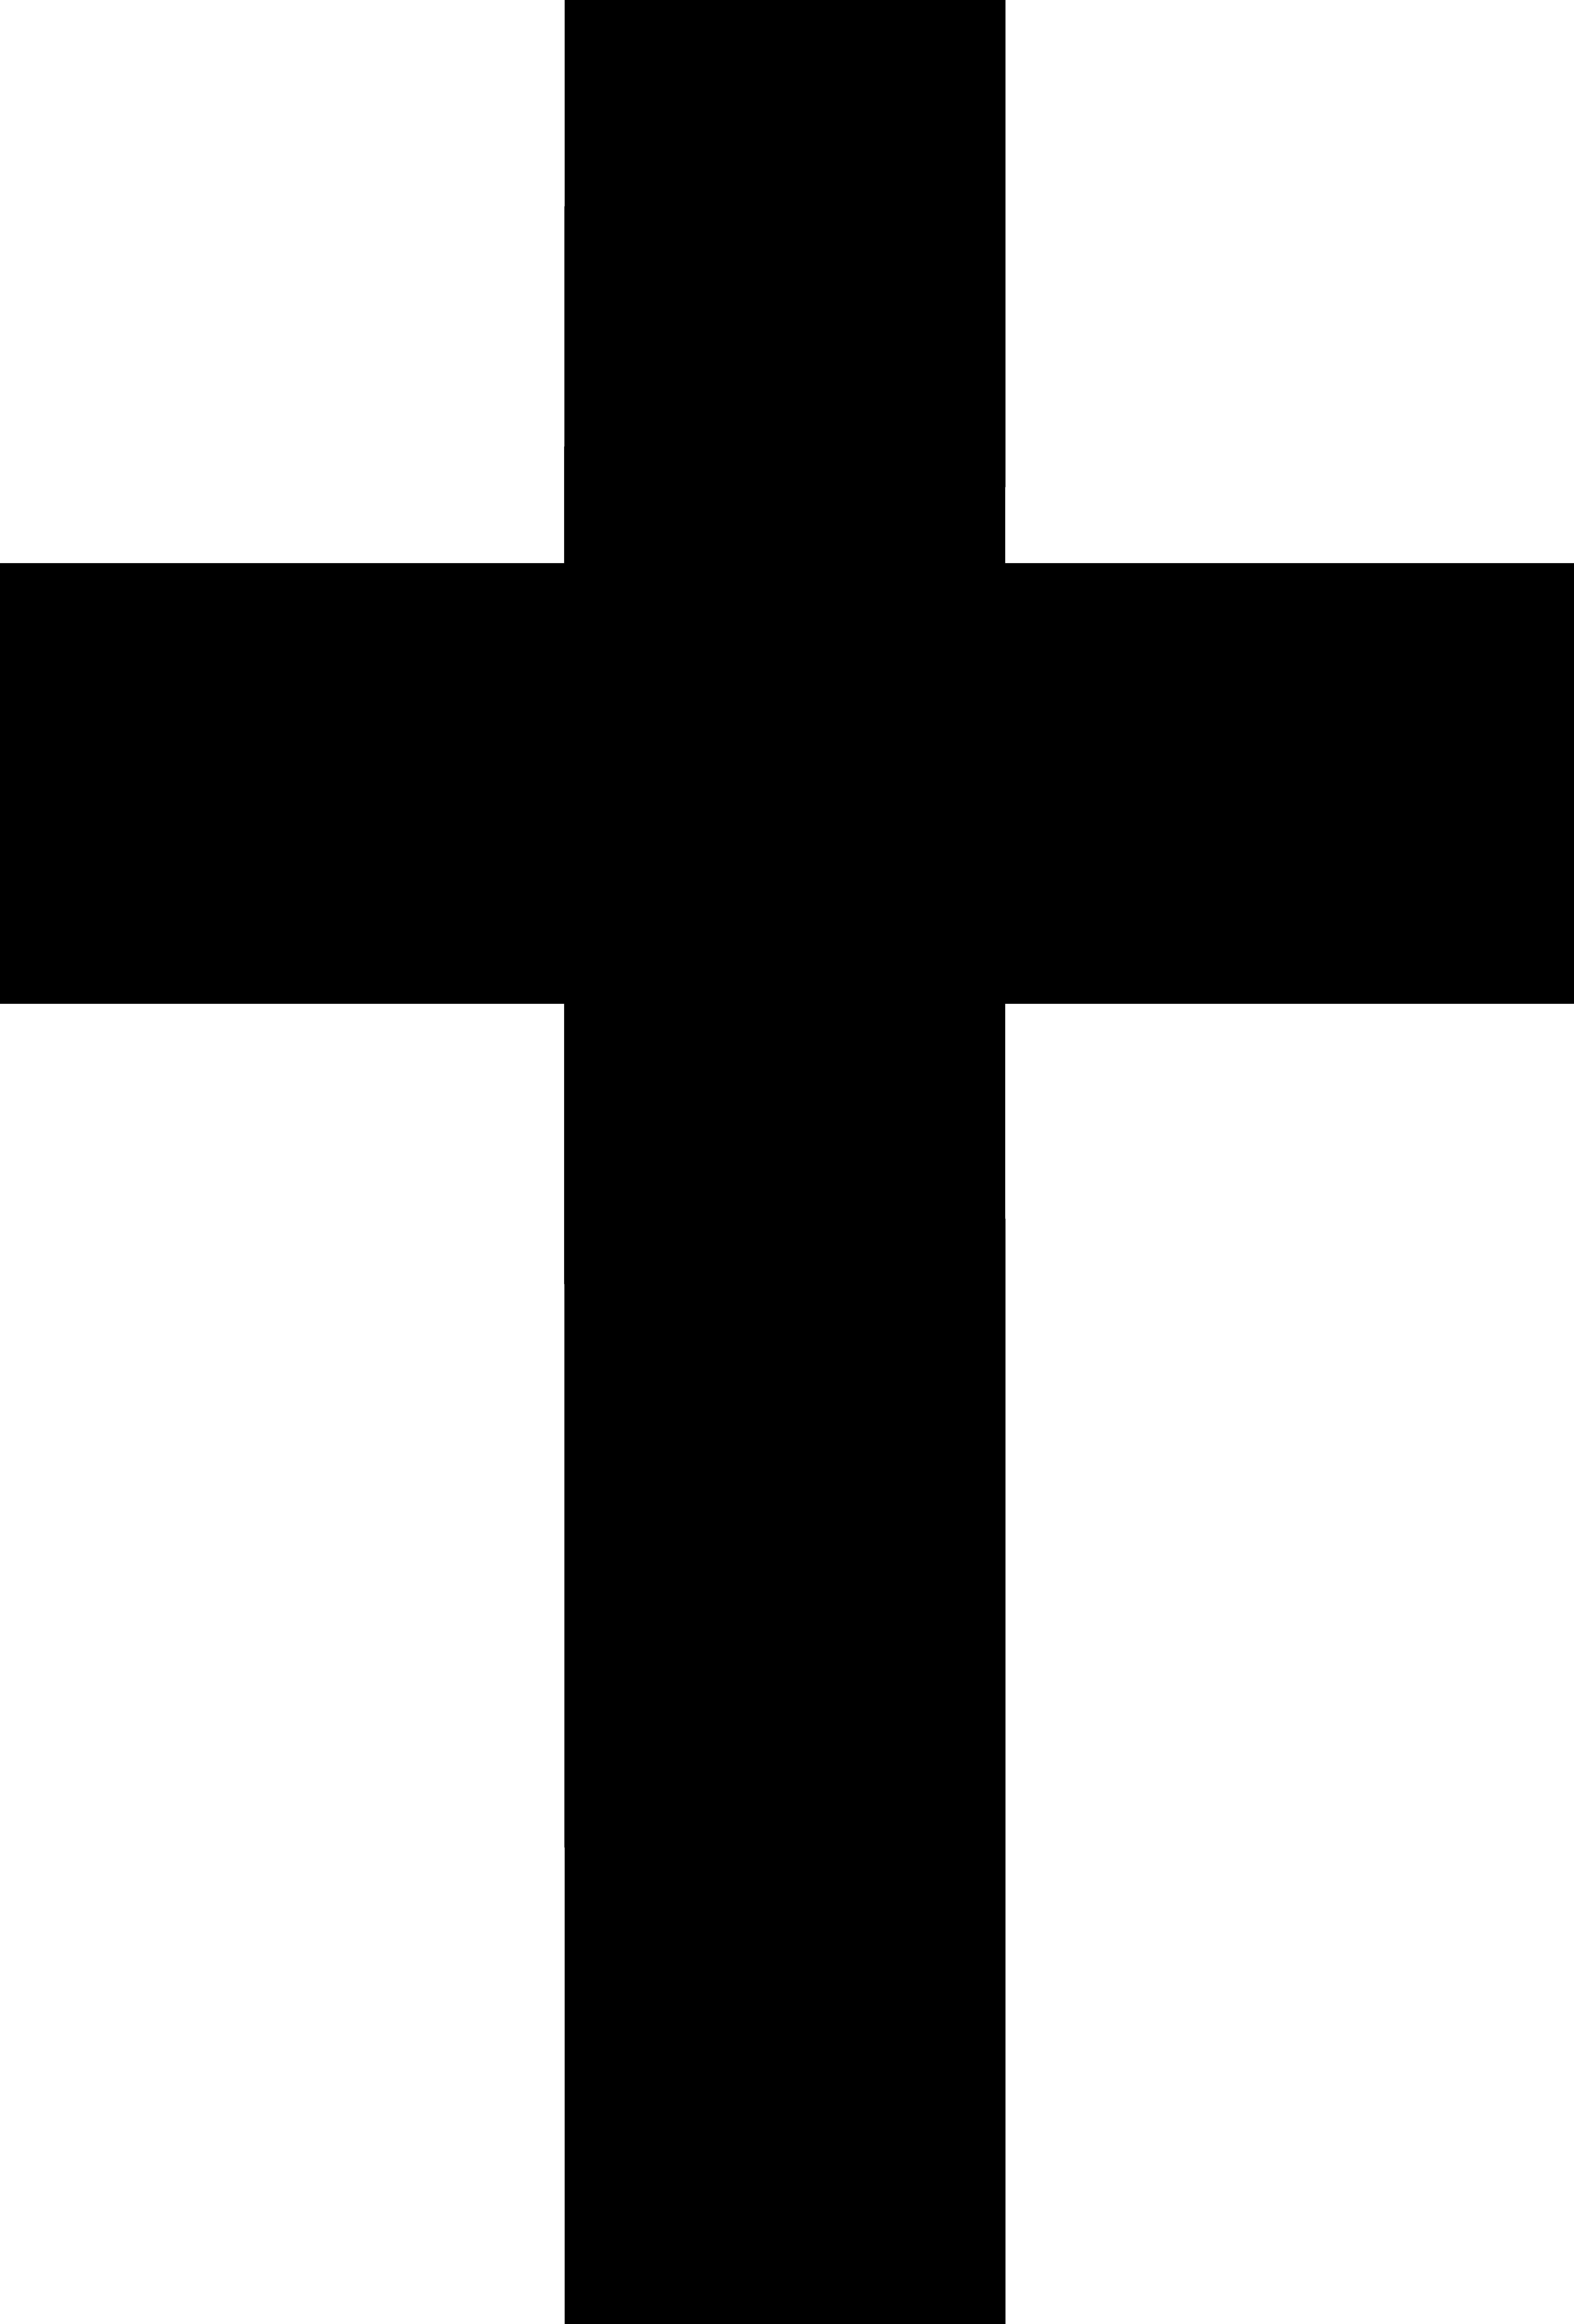 Black Cross Silhouette Design Free Clip Art Cross Silhouette Cross Clipart Clip Art